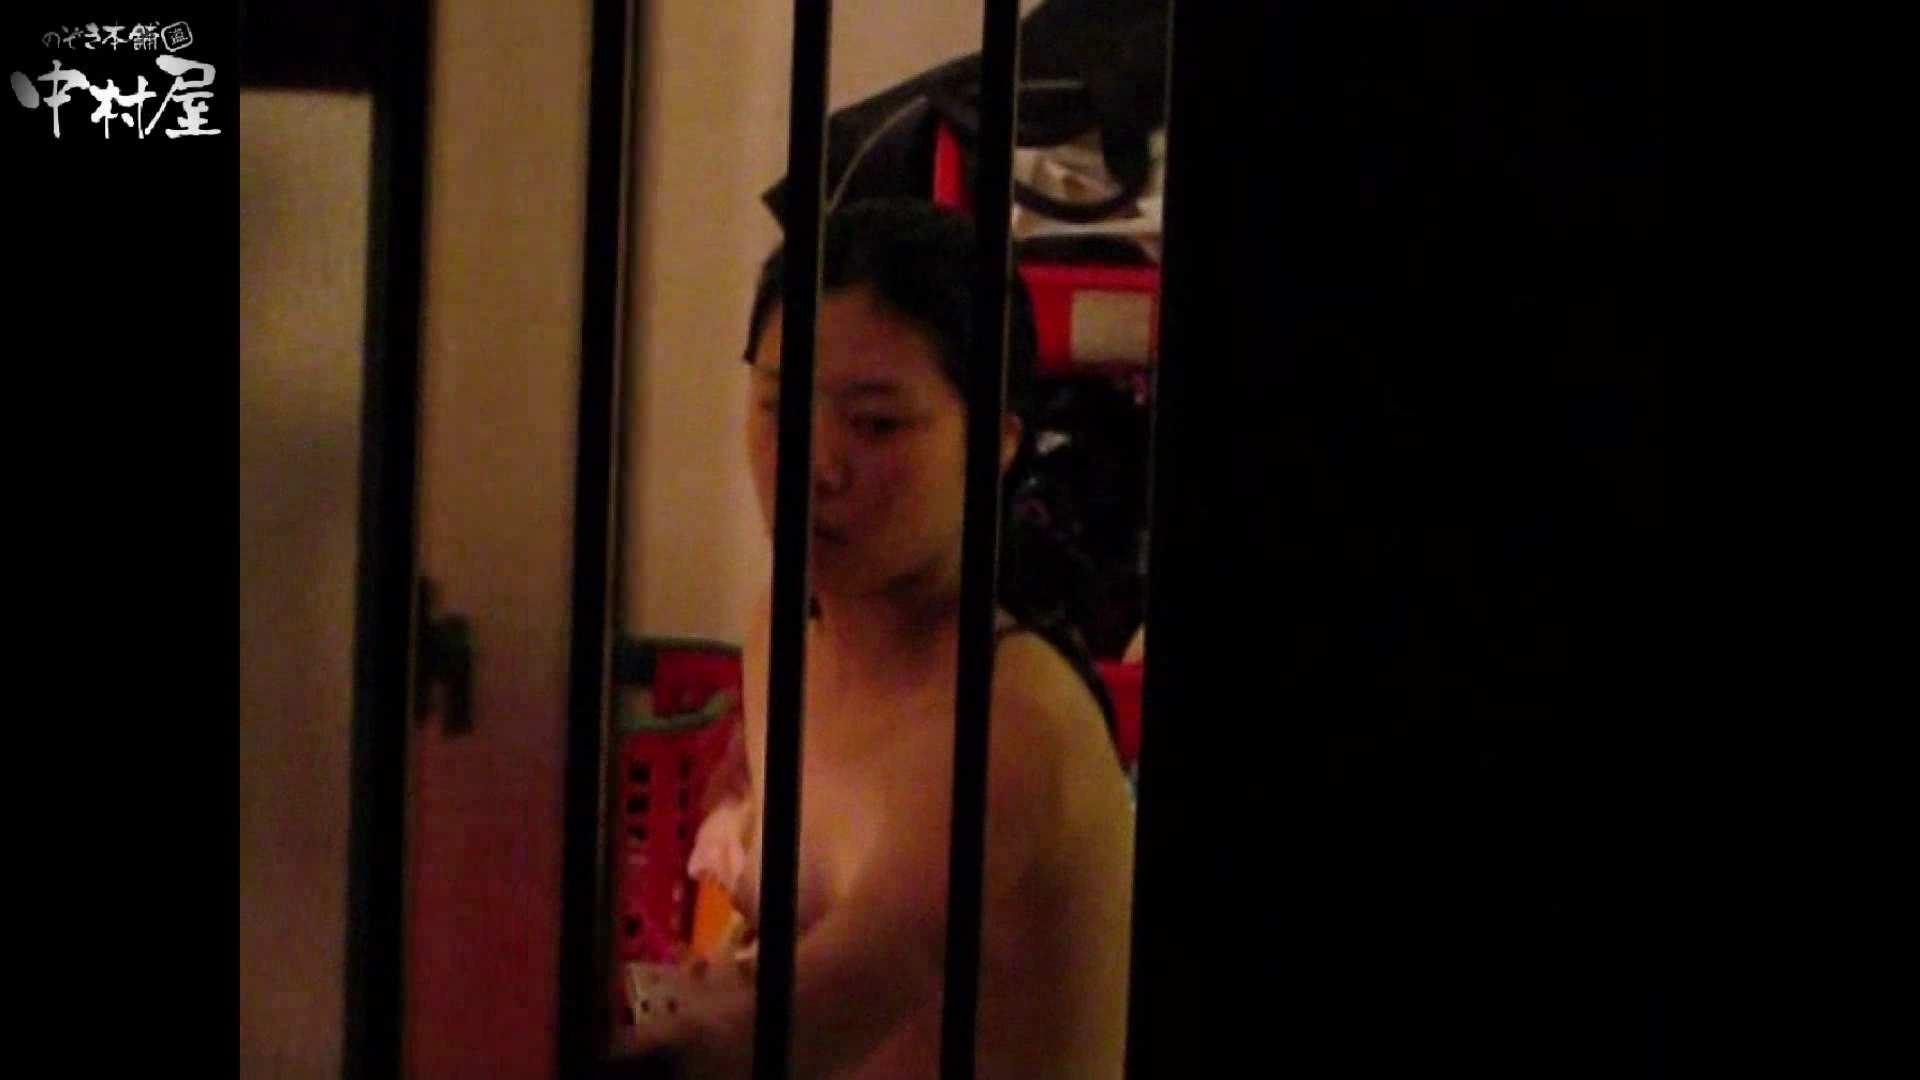 民家風呂専門盗撮師の超危険映像 vol.003 美少女ヌード   盗撮  58pic 35